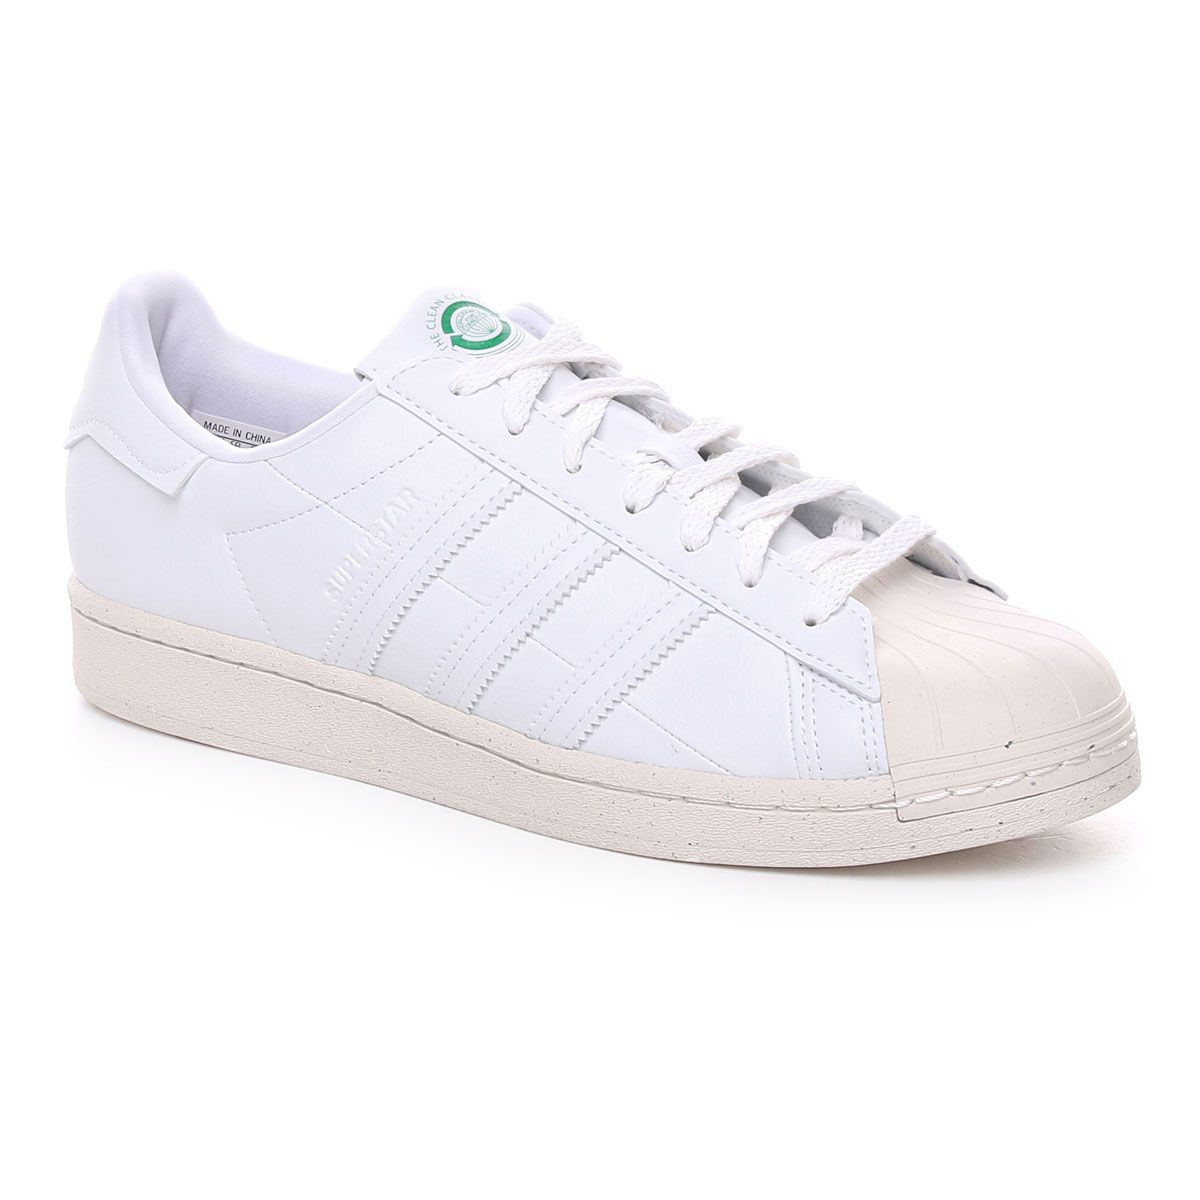 Adidas Superstar Vegan Uomo Bianco